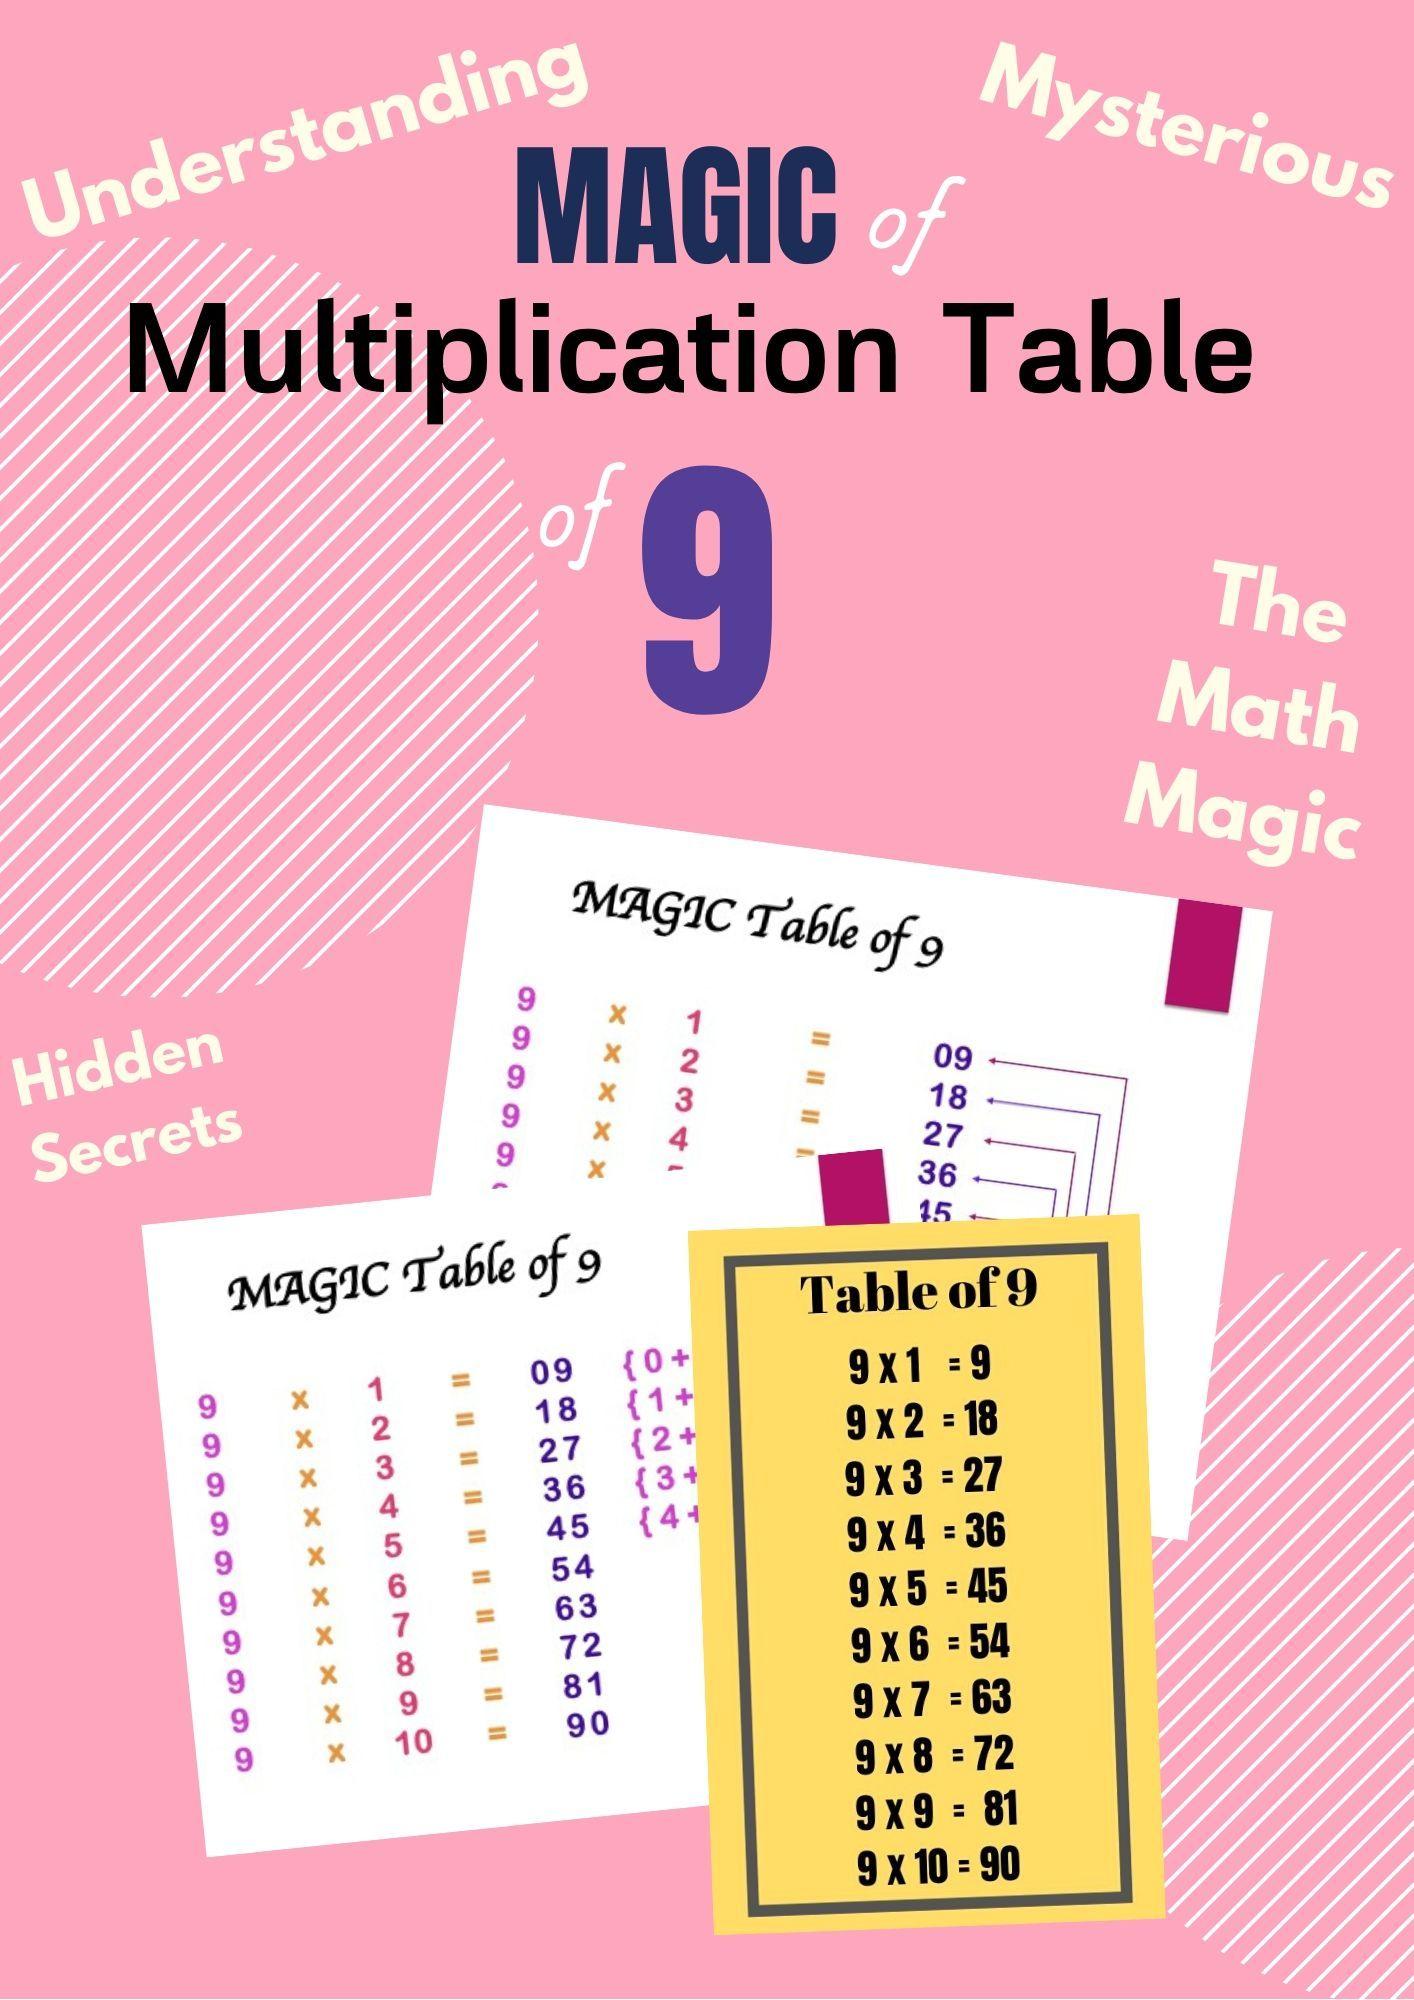 Tricks To Memorize Math Tables